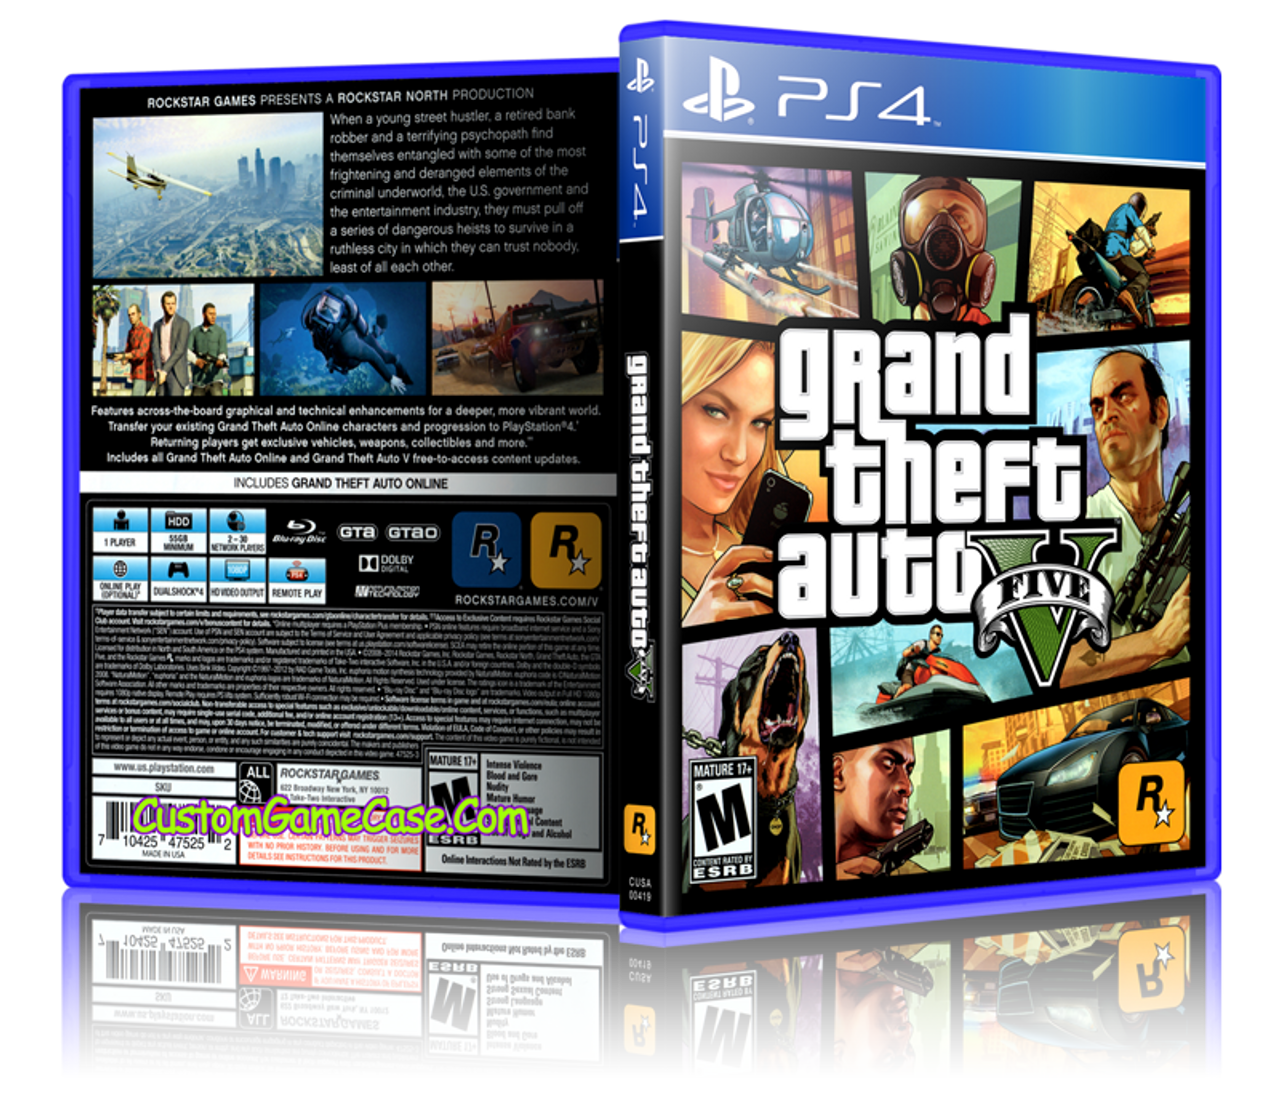 grand theft auto 5 playstation 4 game gameswallsorg